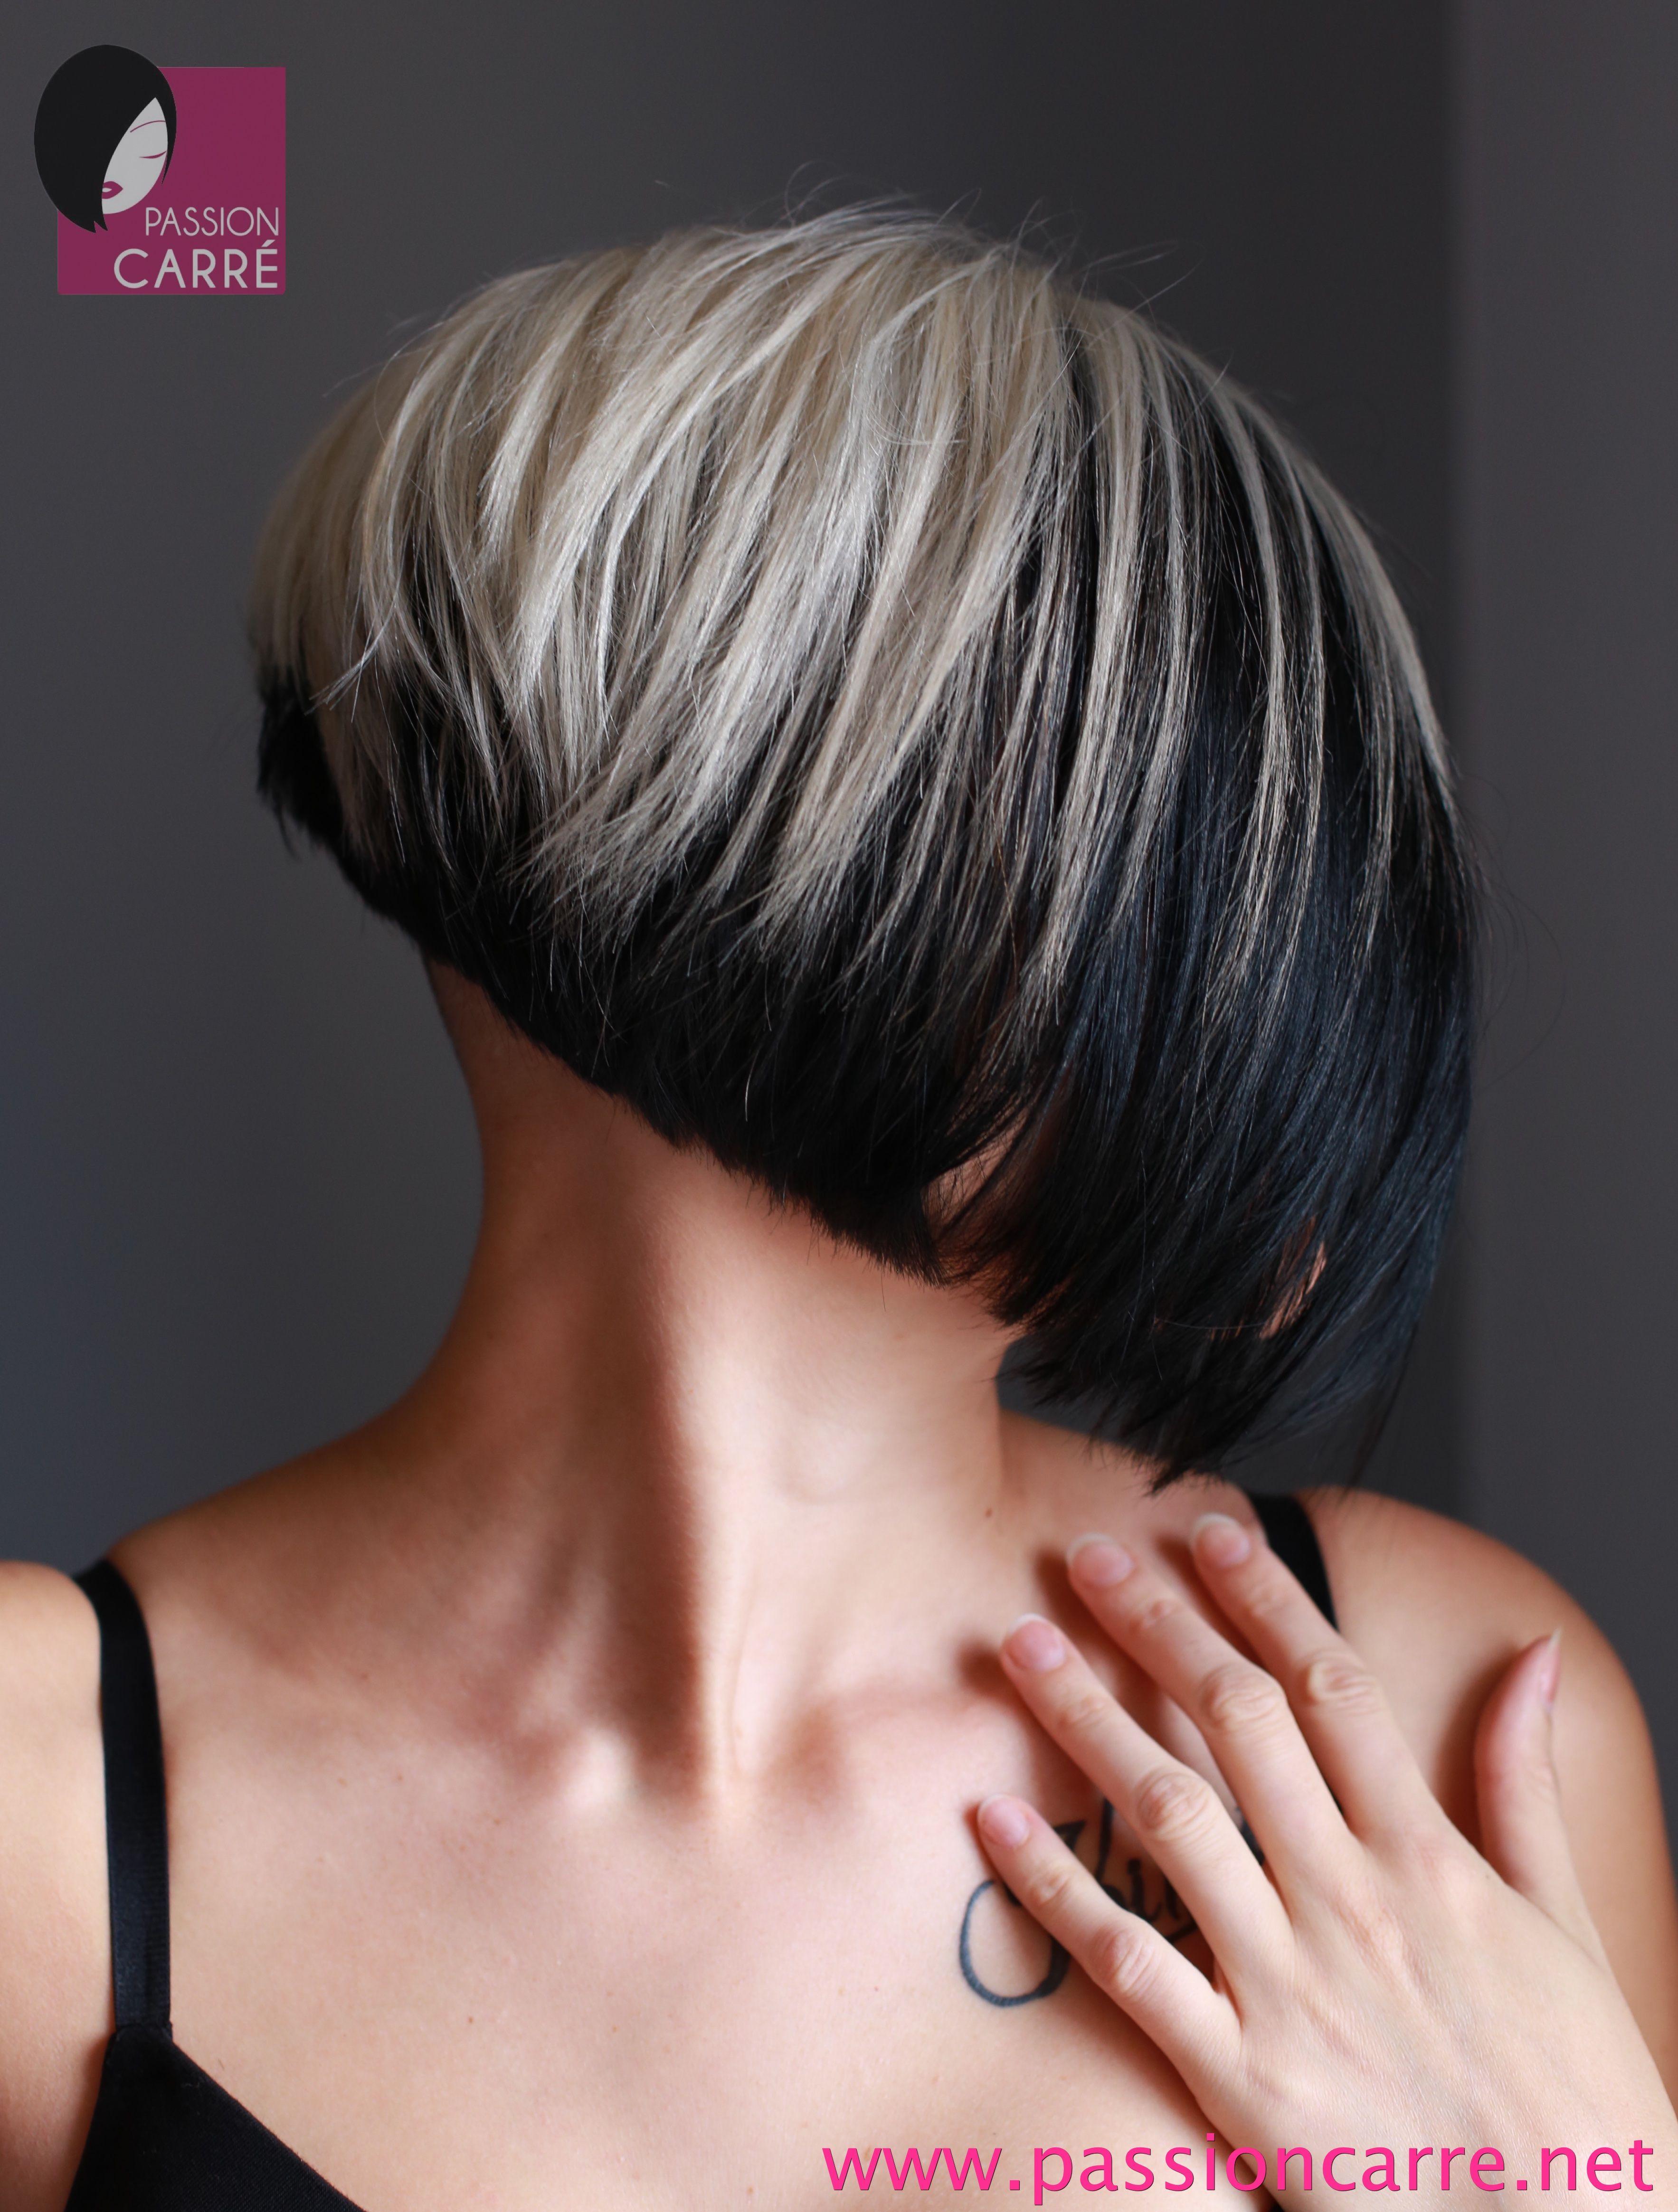 elodie songe changer de style de coiffure passion carr two toned hair 2 pinterest. Black Bedroom Furniture Sets. Home Design Ideas